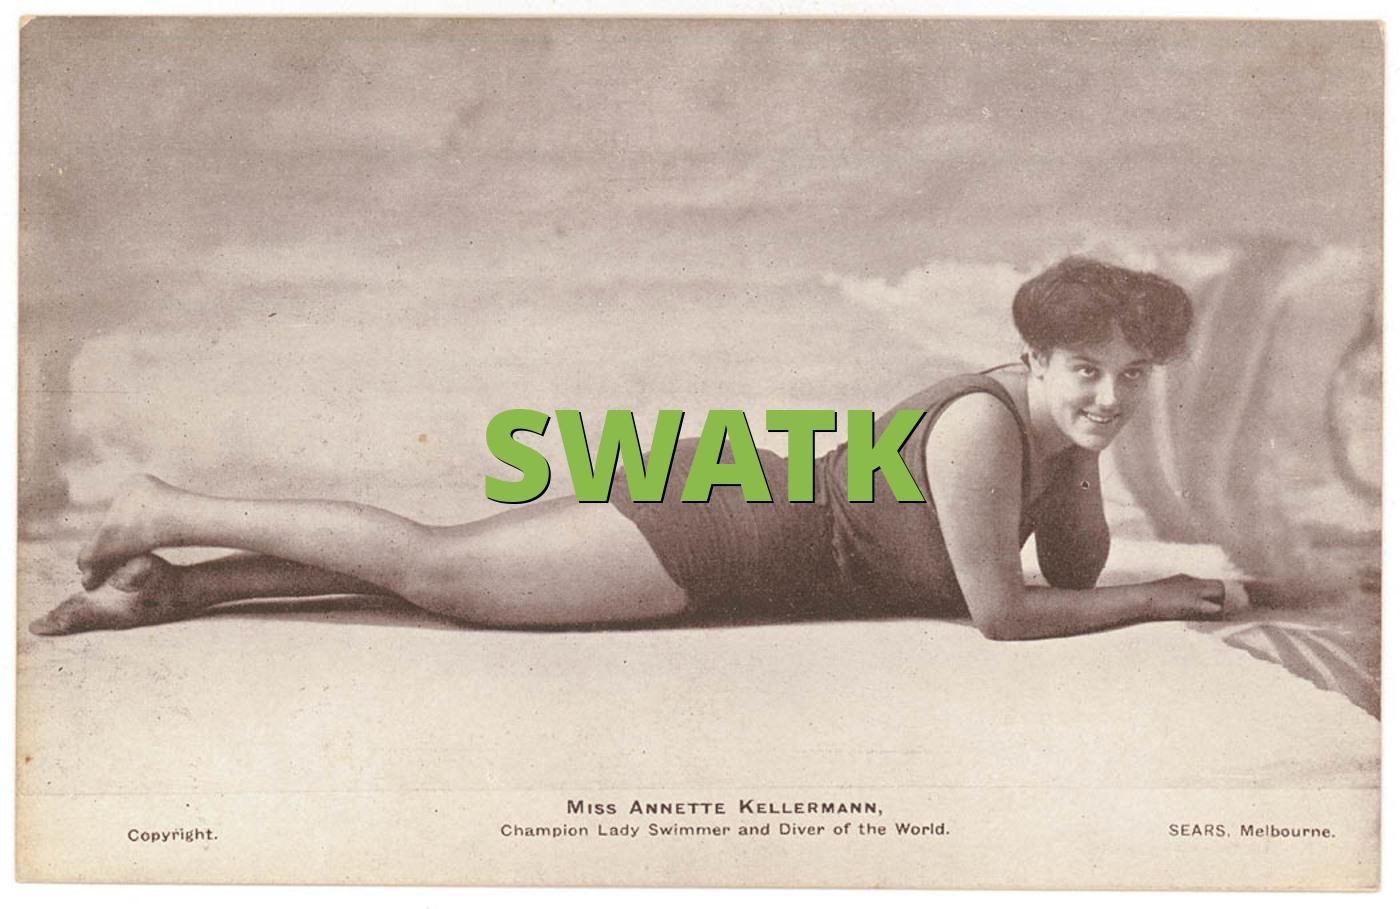 SWATK